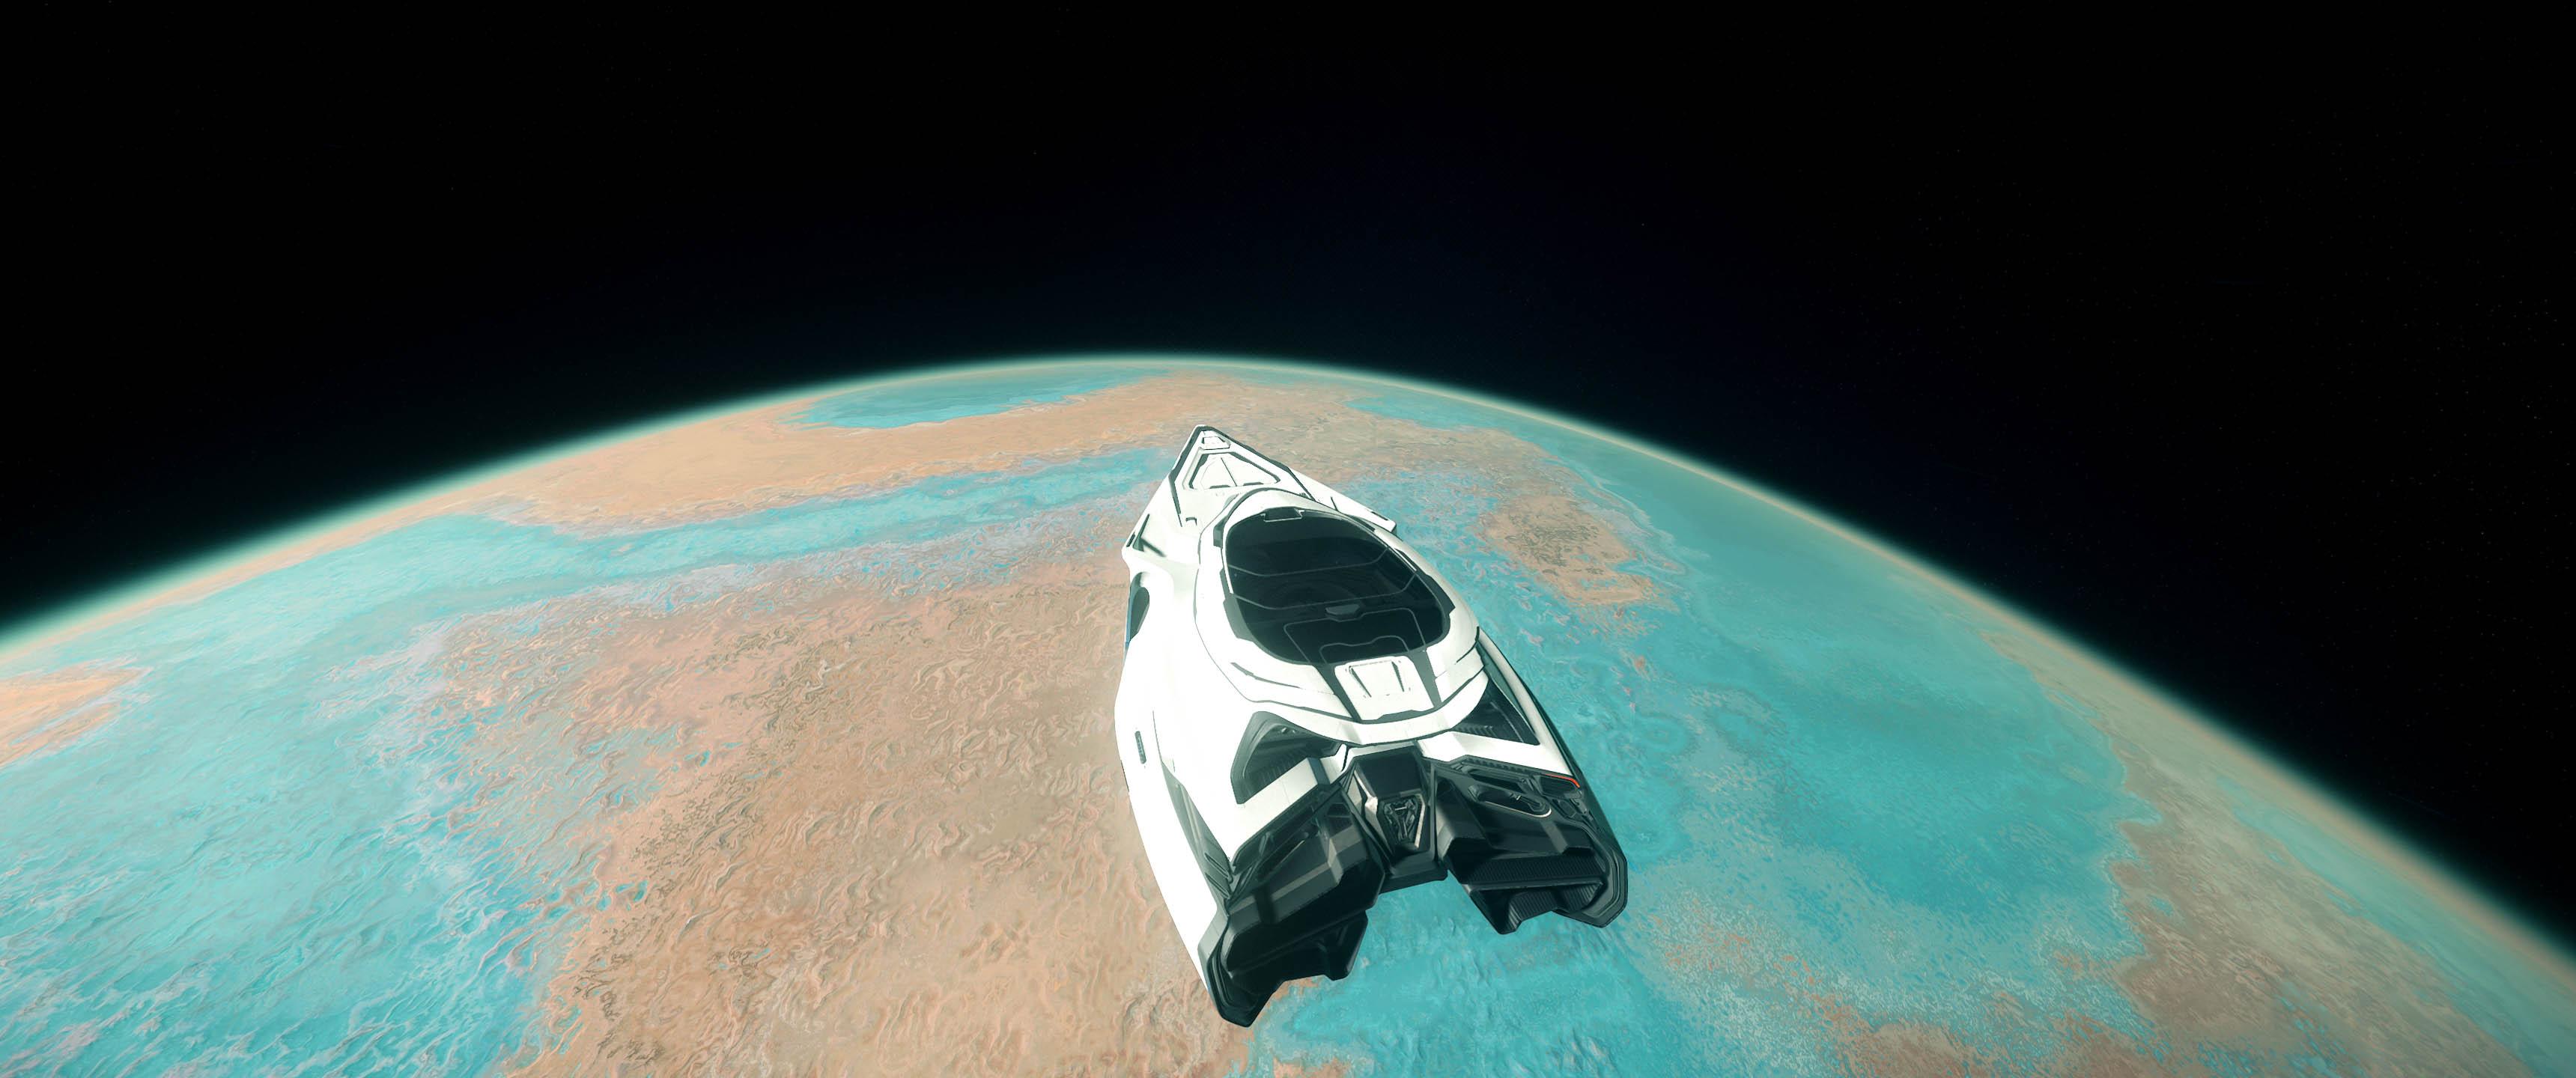 Star Citizen 3.8.0 - 890 Jump over Magda orbiting Hurston